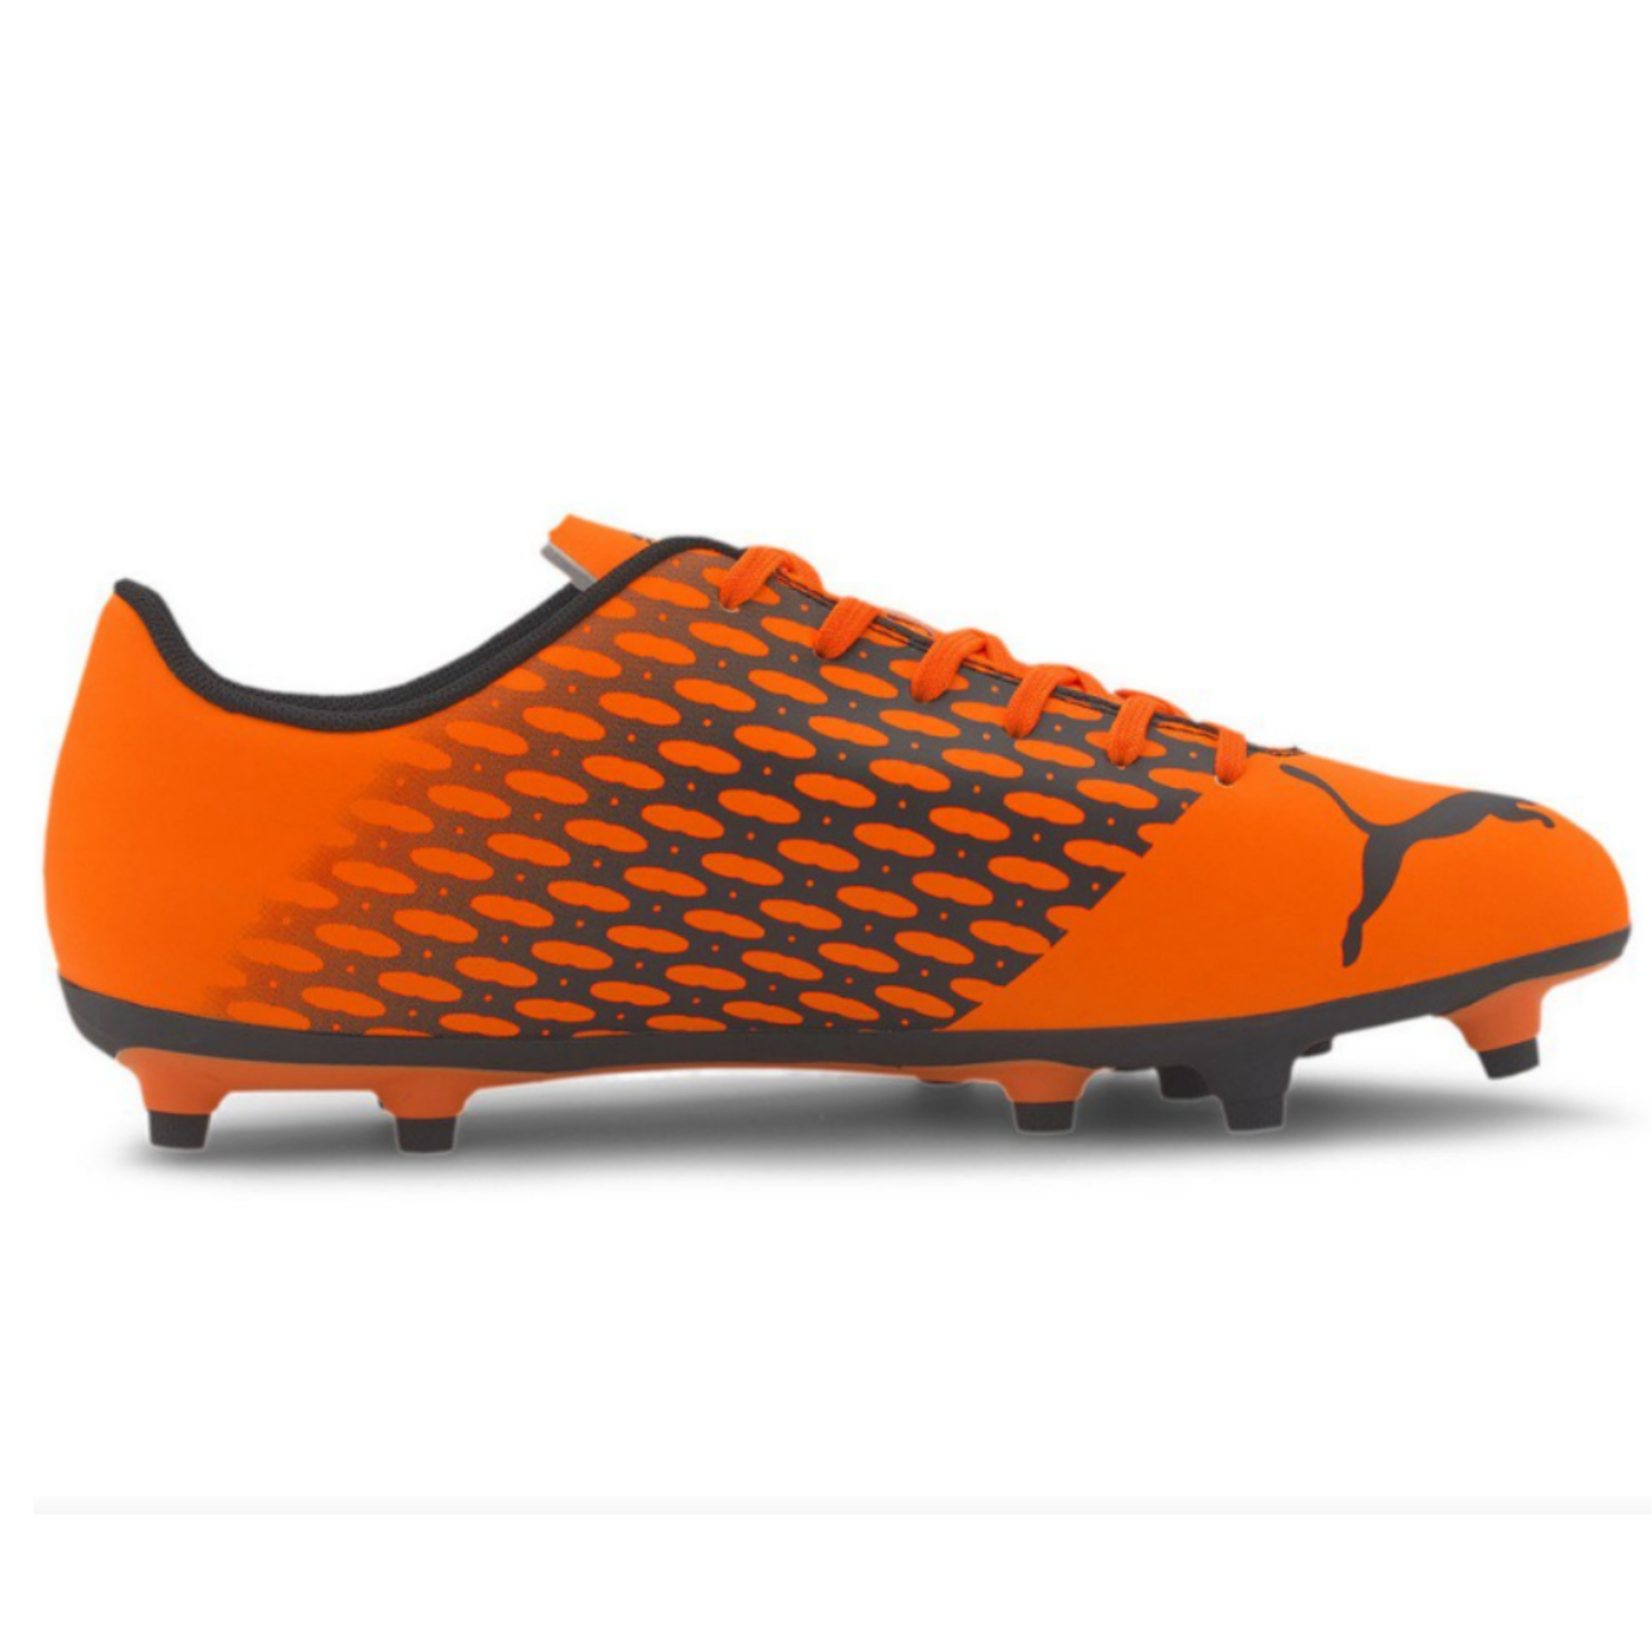 Puma Spirit III FG Jr Soccer Cleat